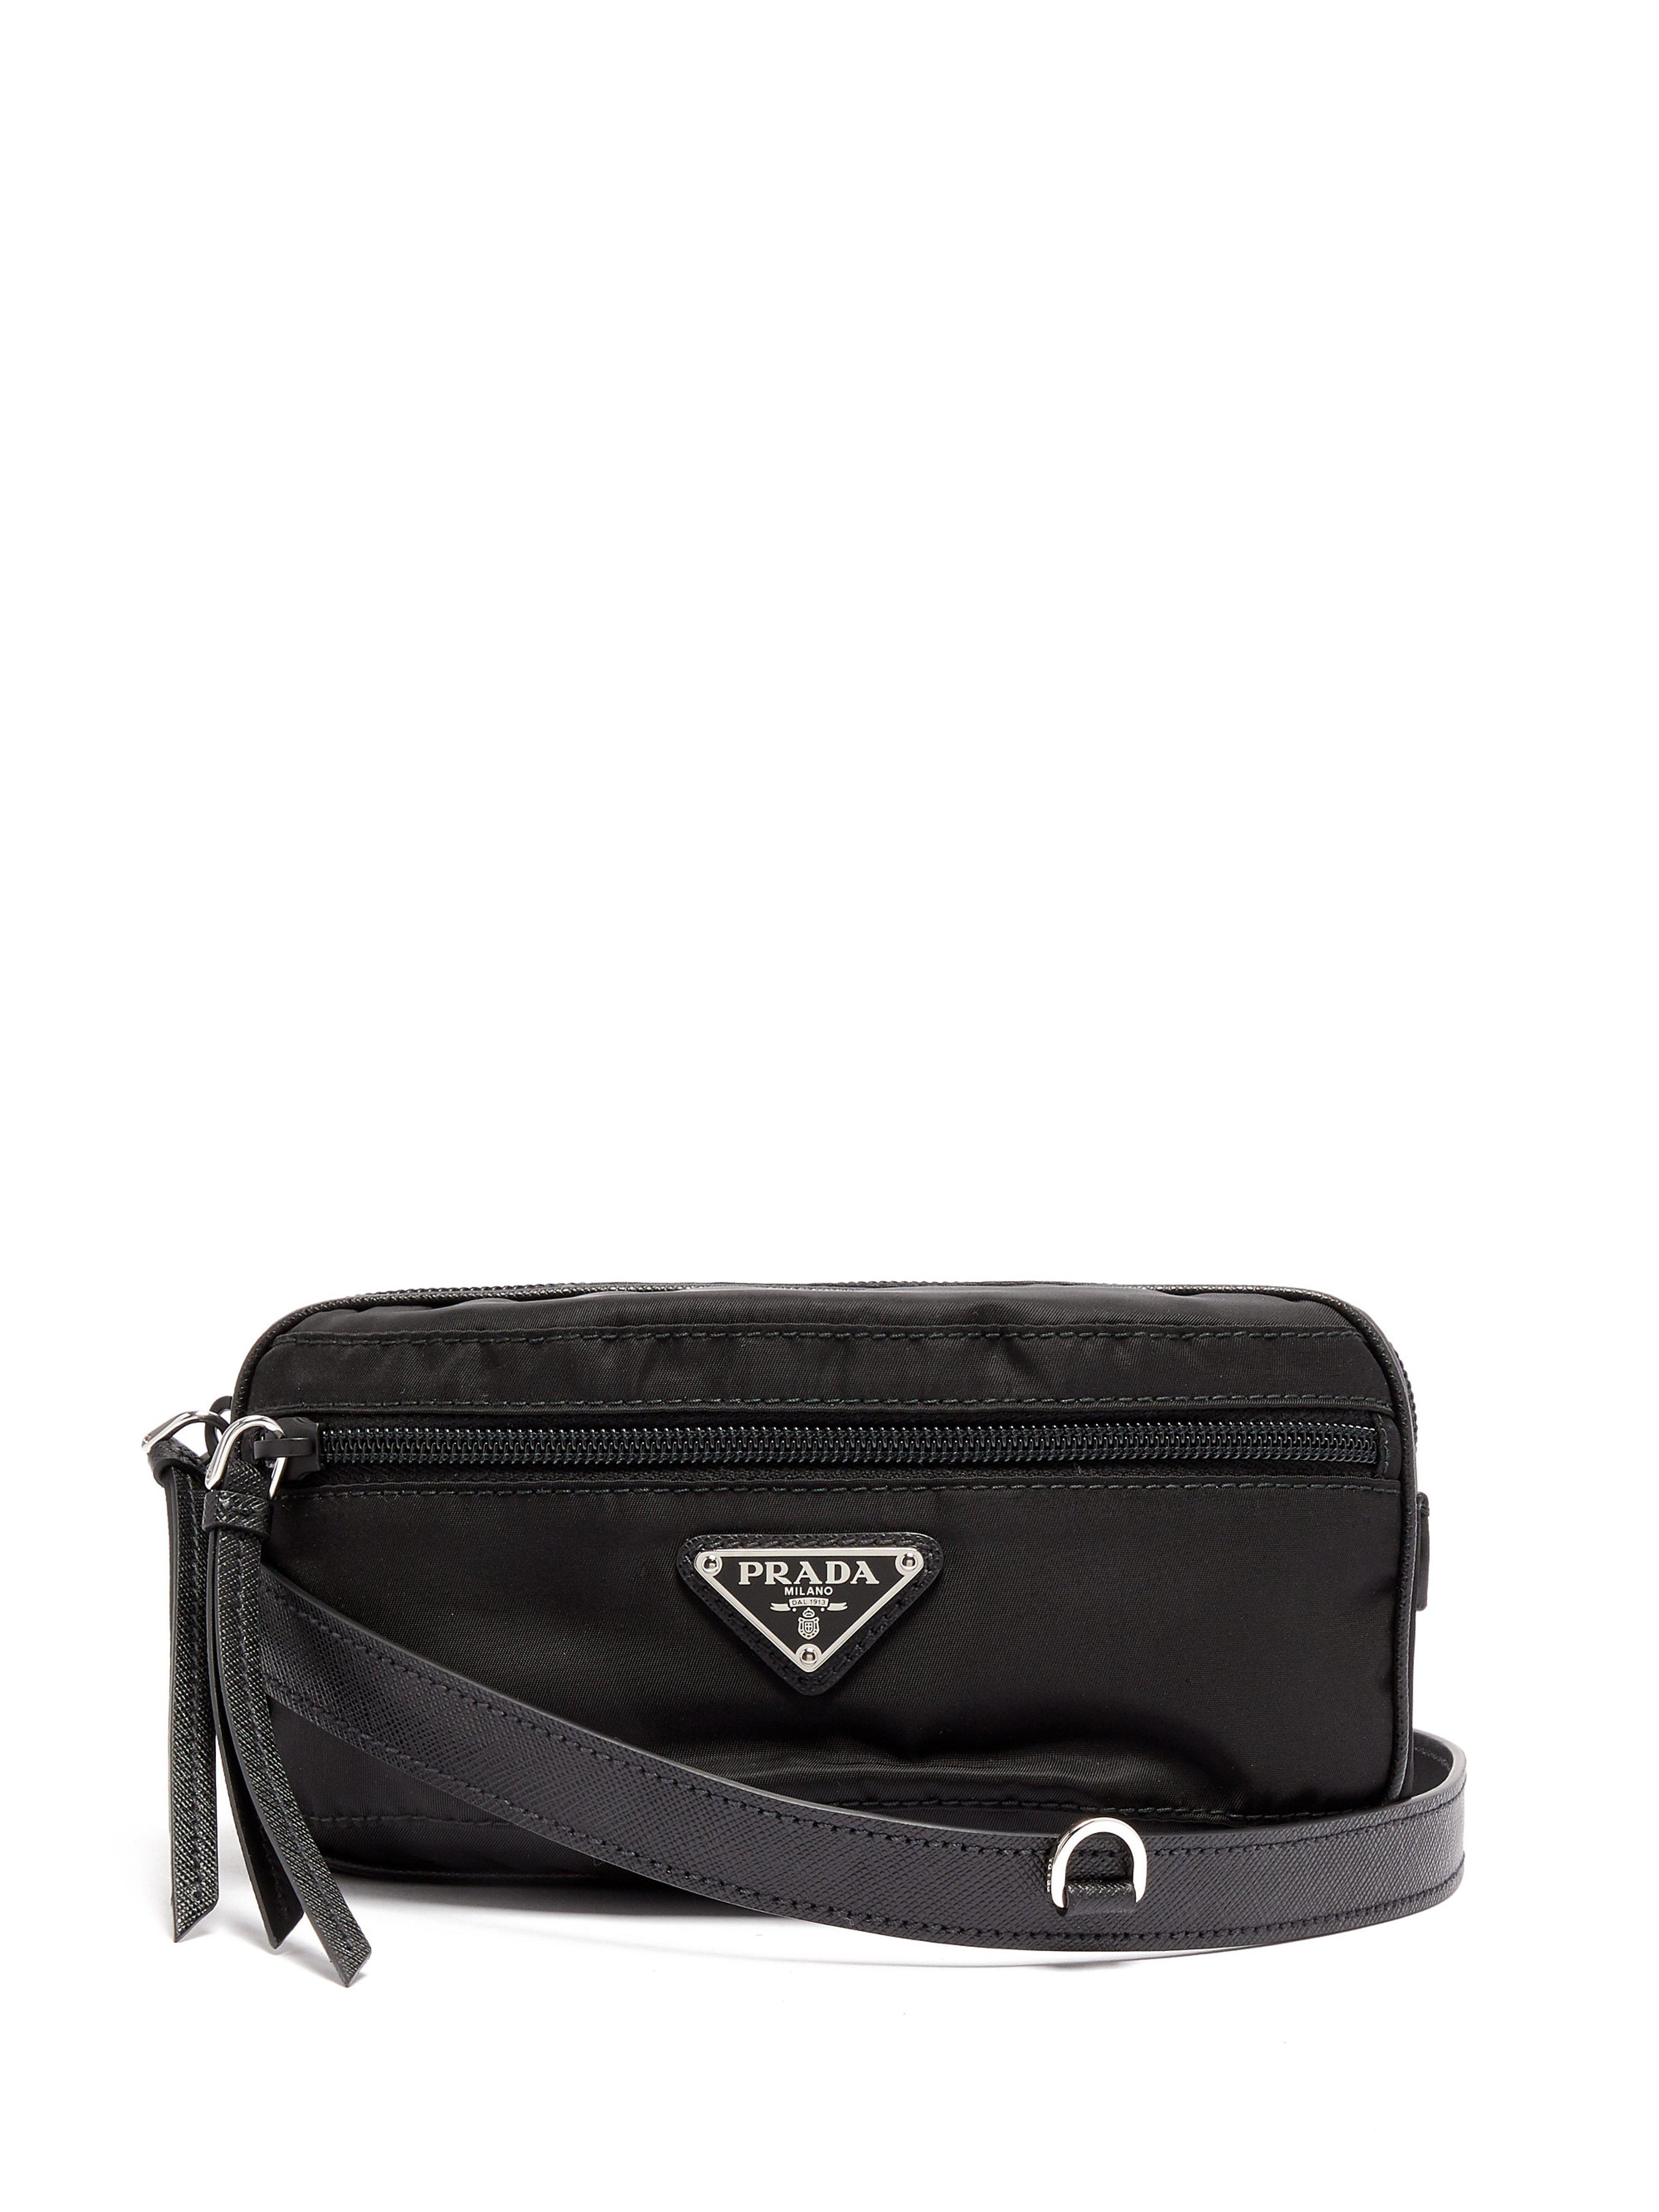 7ac886df6454 Prada - Black Sac ceinture en cuir et nylon - Lyst. Afficher en plein écran